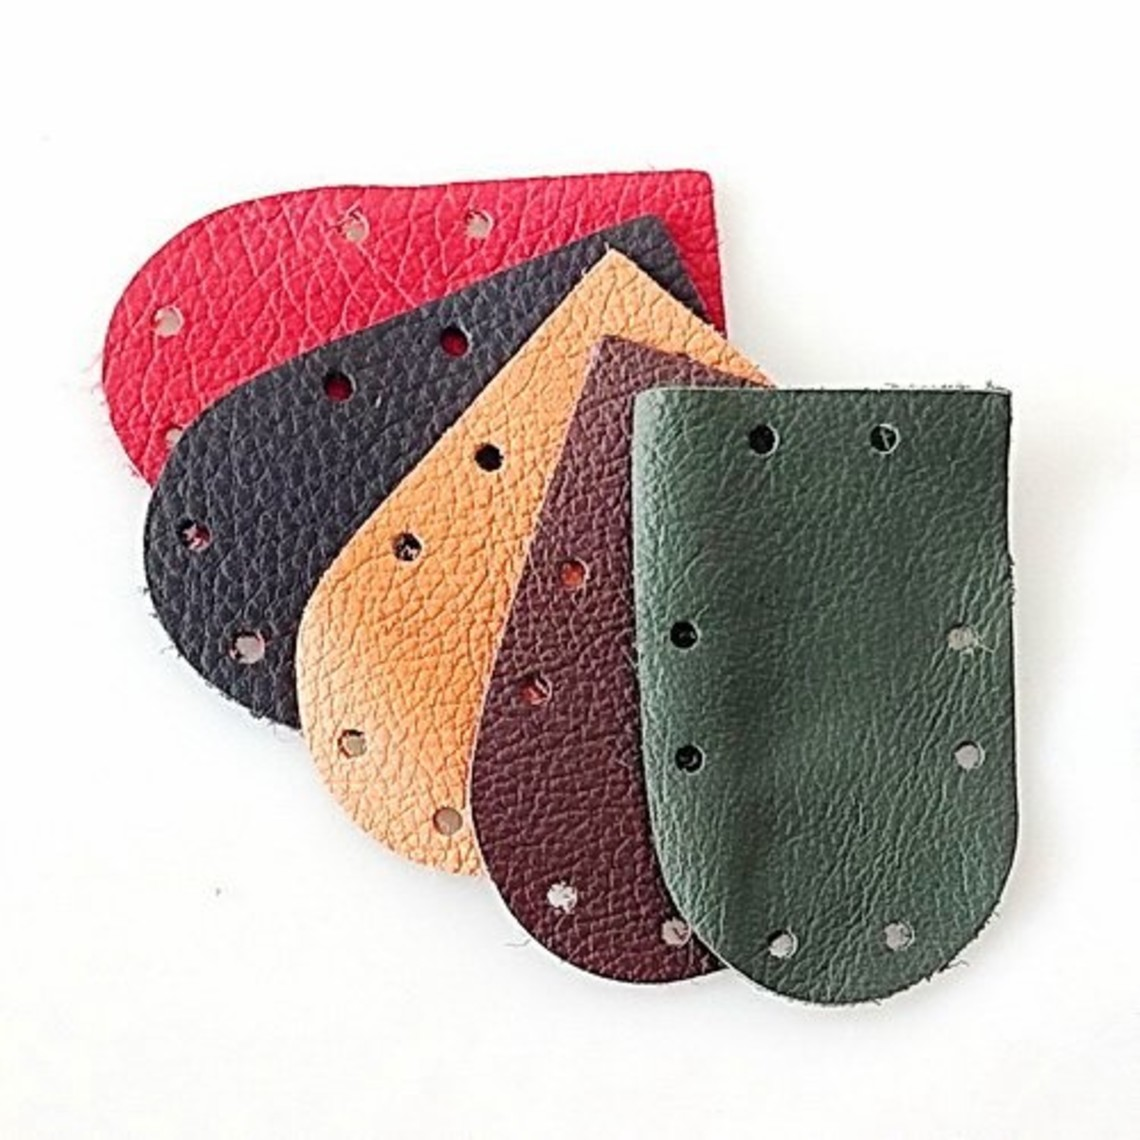 50x nappalæder runde stykke for skala rustning, lys brun